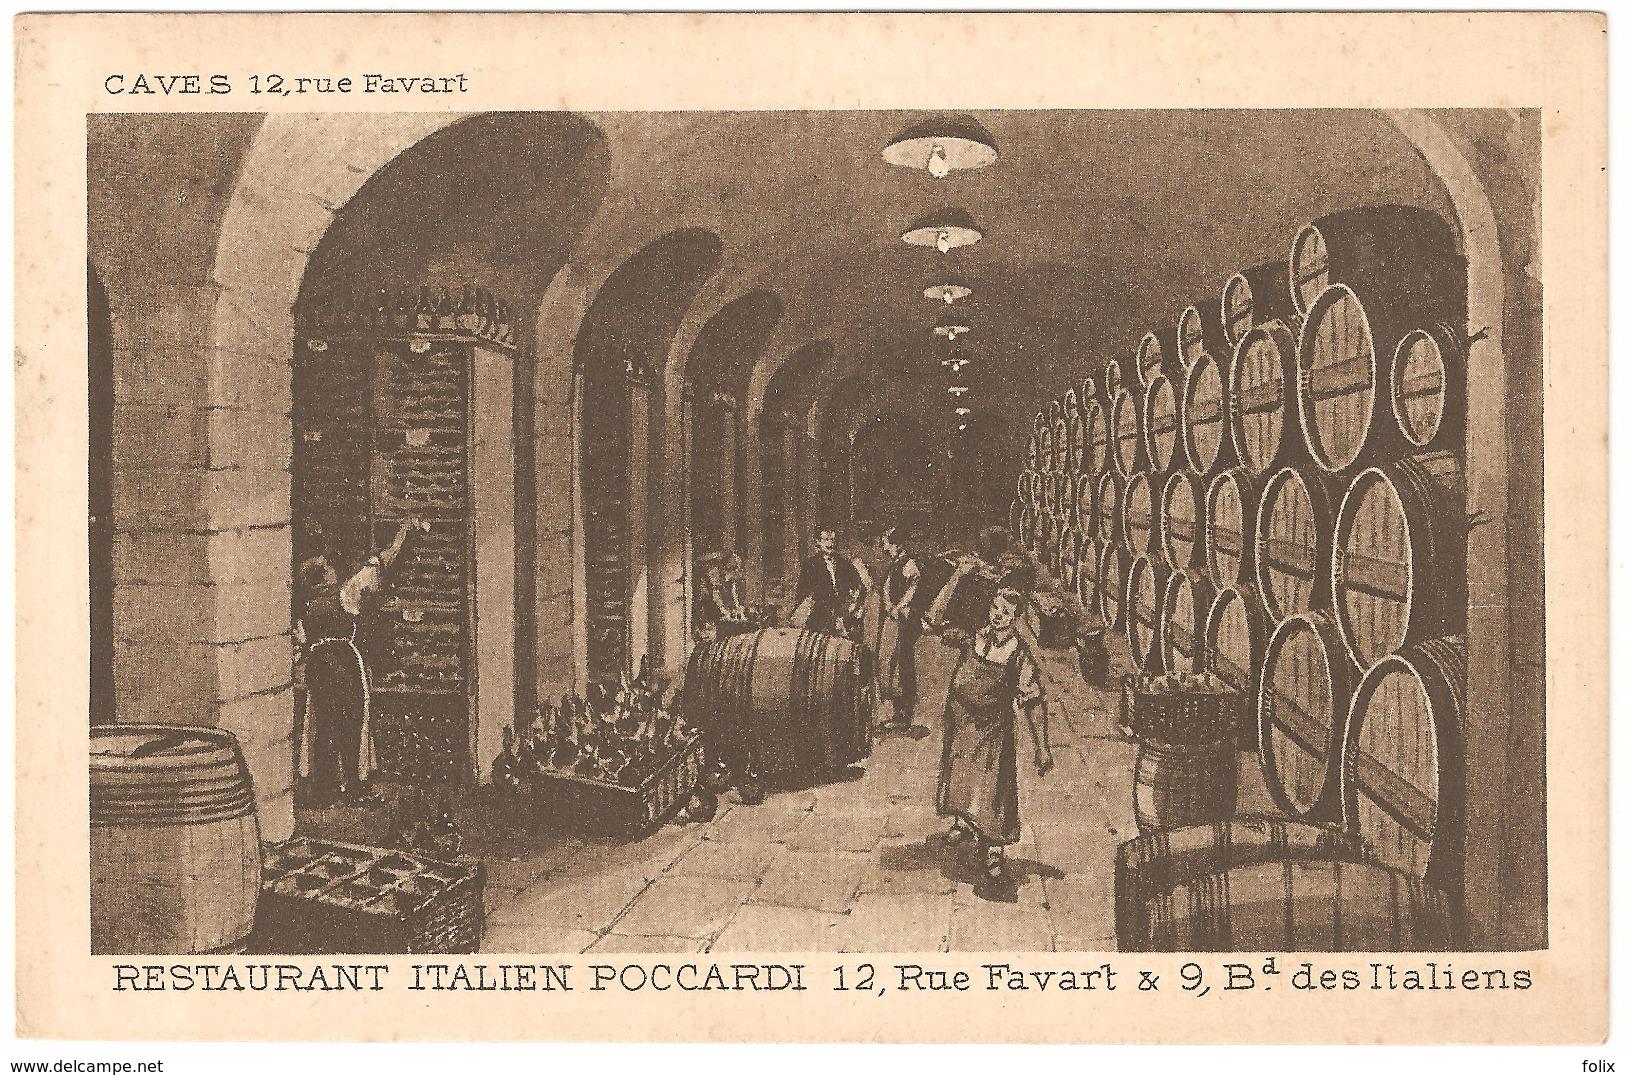 Restaurant Italien Poccardi 12, Rue Favart & 9 Bd Des Italiens - Caves - Cafés, Hoteles, Restaurantes